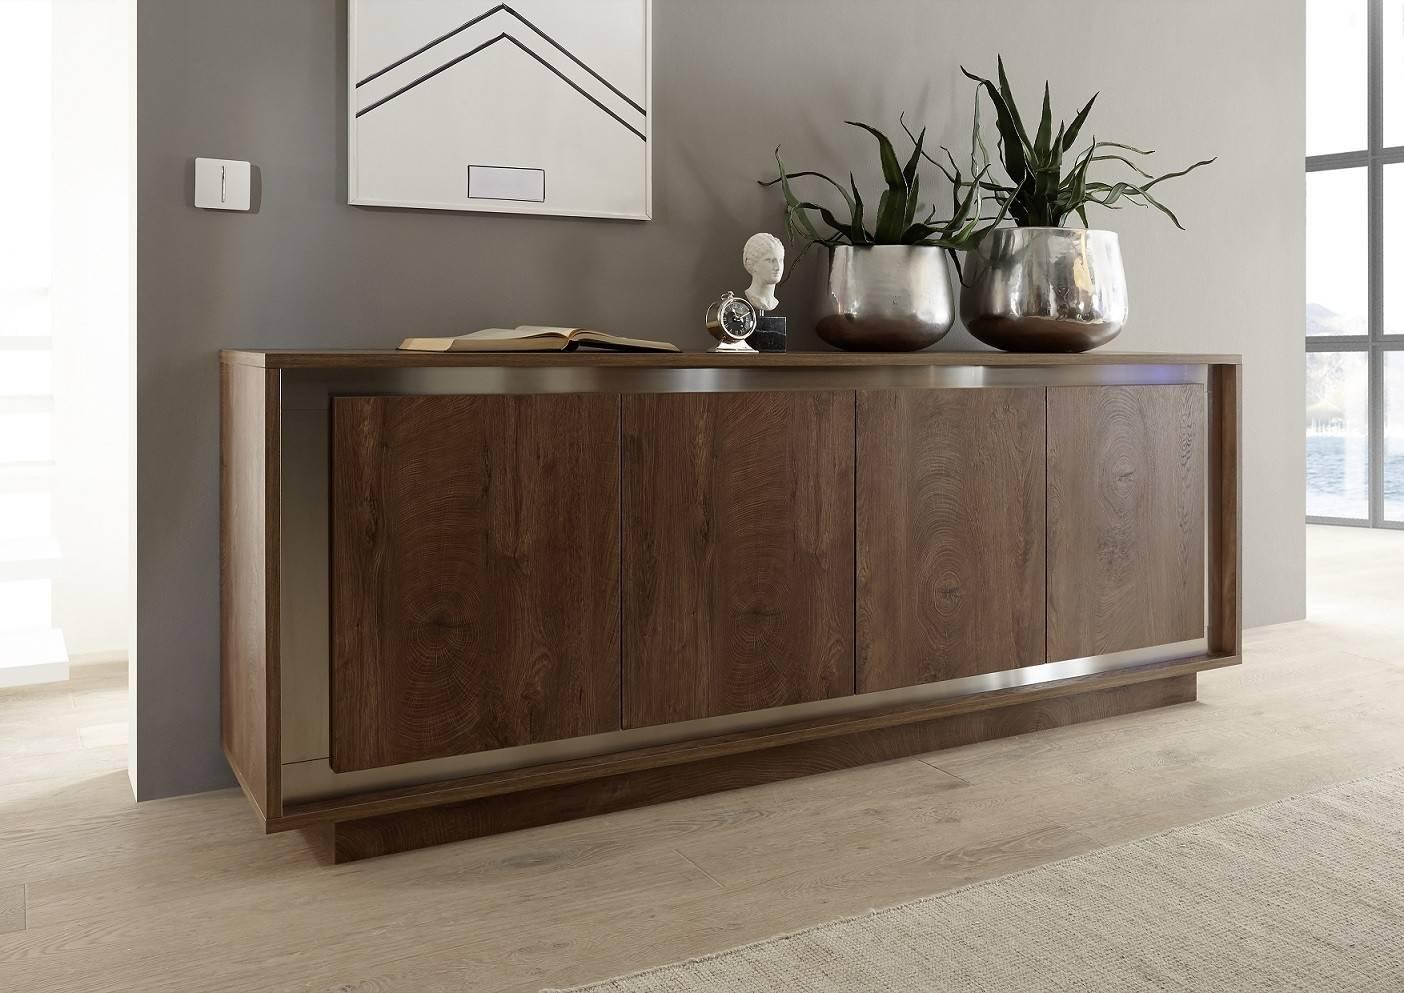 Modern Sideboards Uk - Sena Home Furniture with Lounge Sideboards (Image 7 of 15)